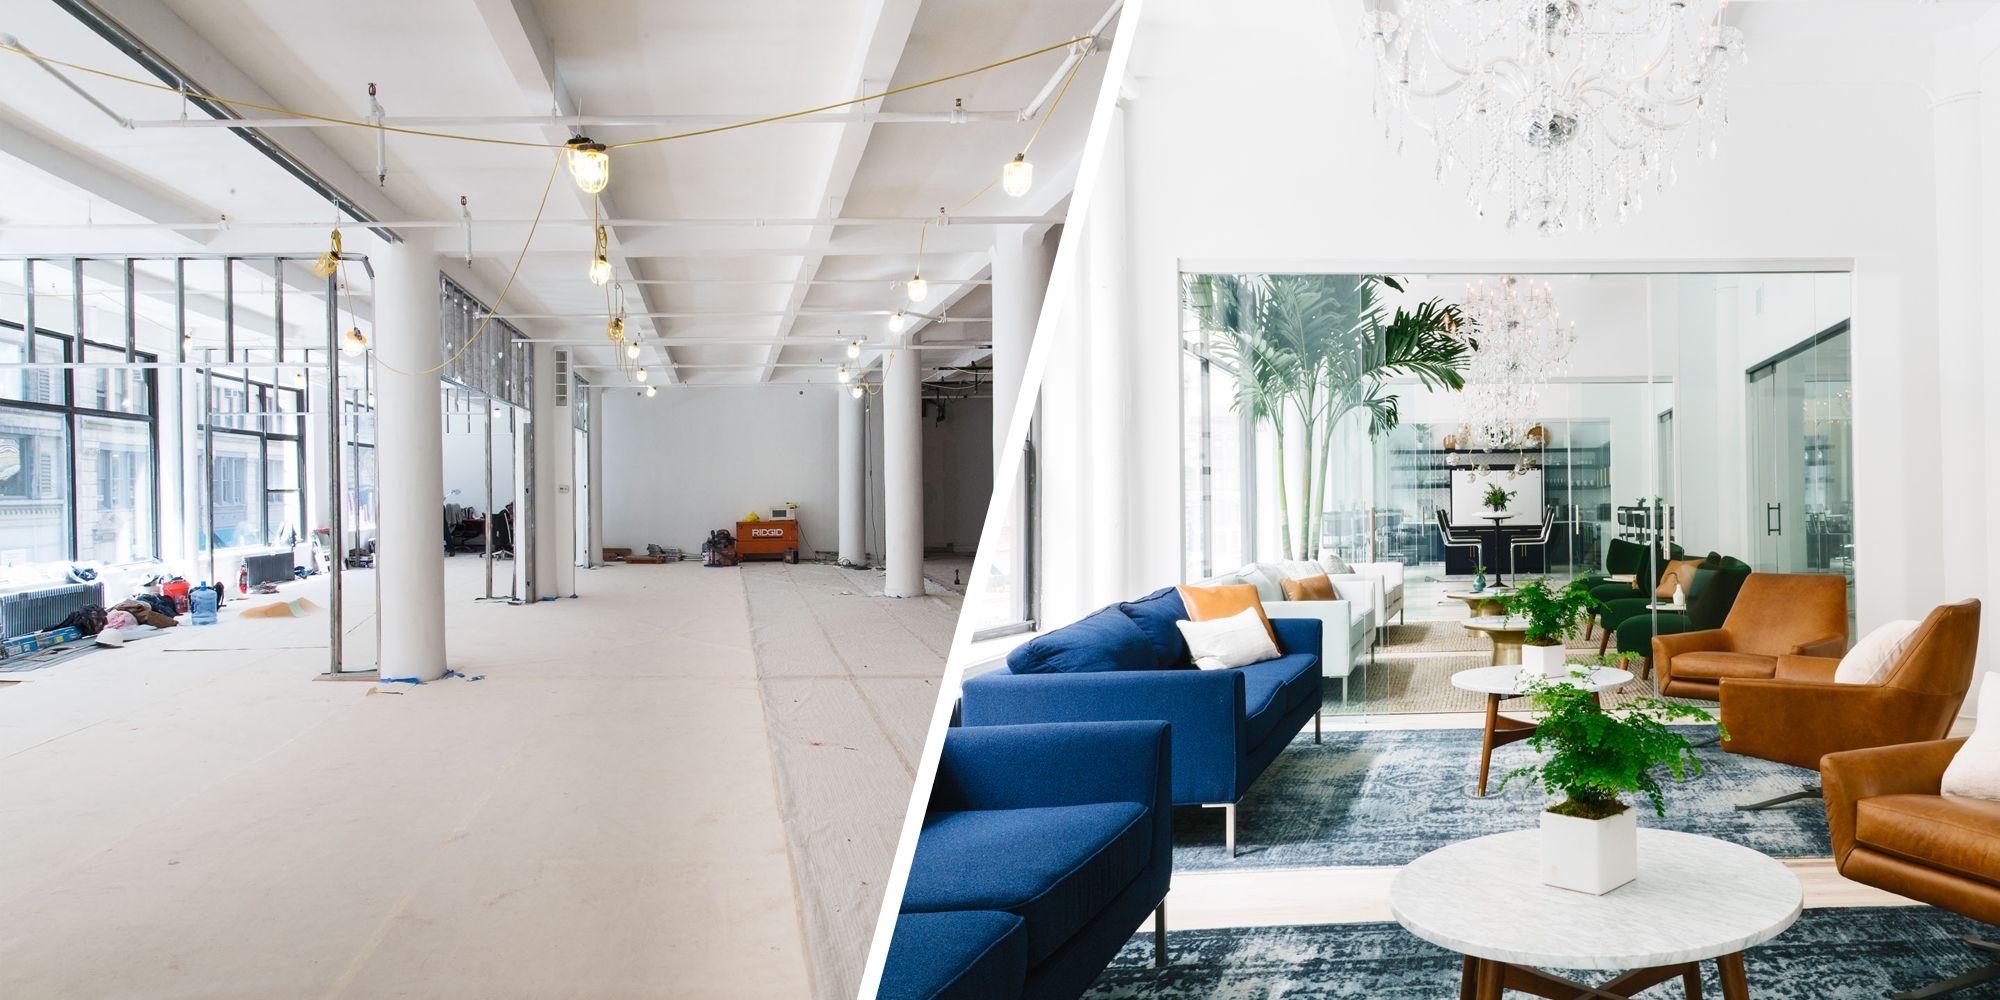 homepolish office & Homepolish Office Design Ideas - Office Interior Design